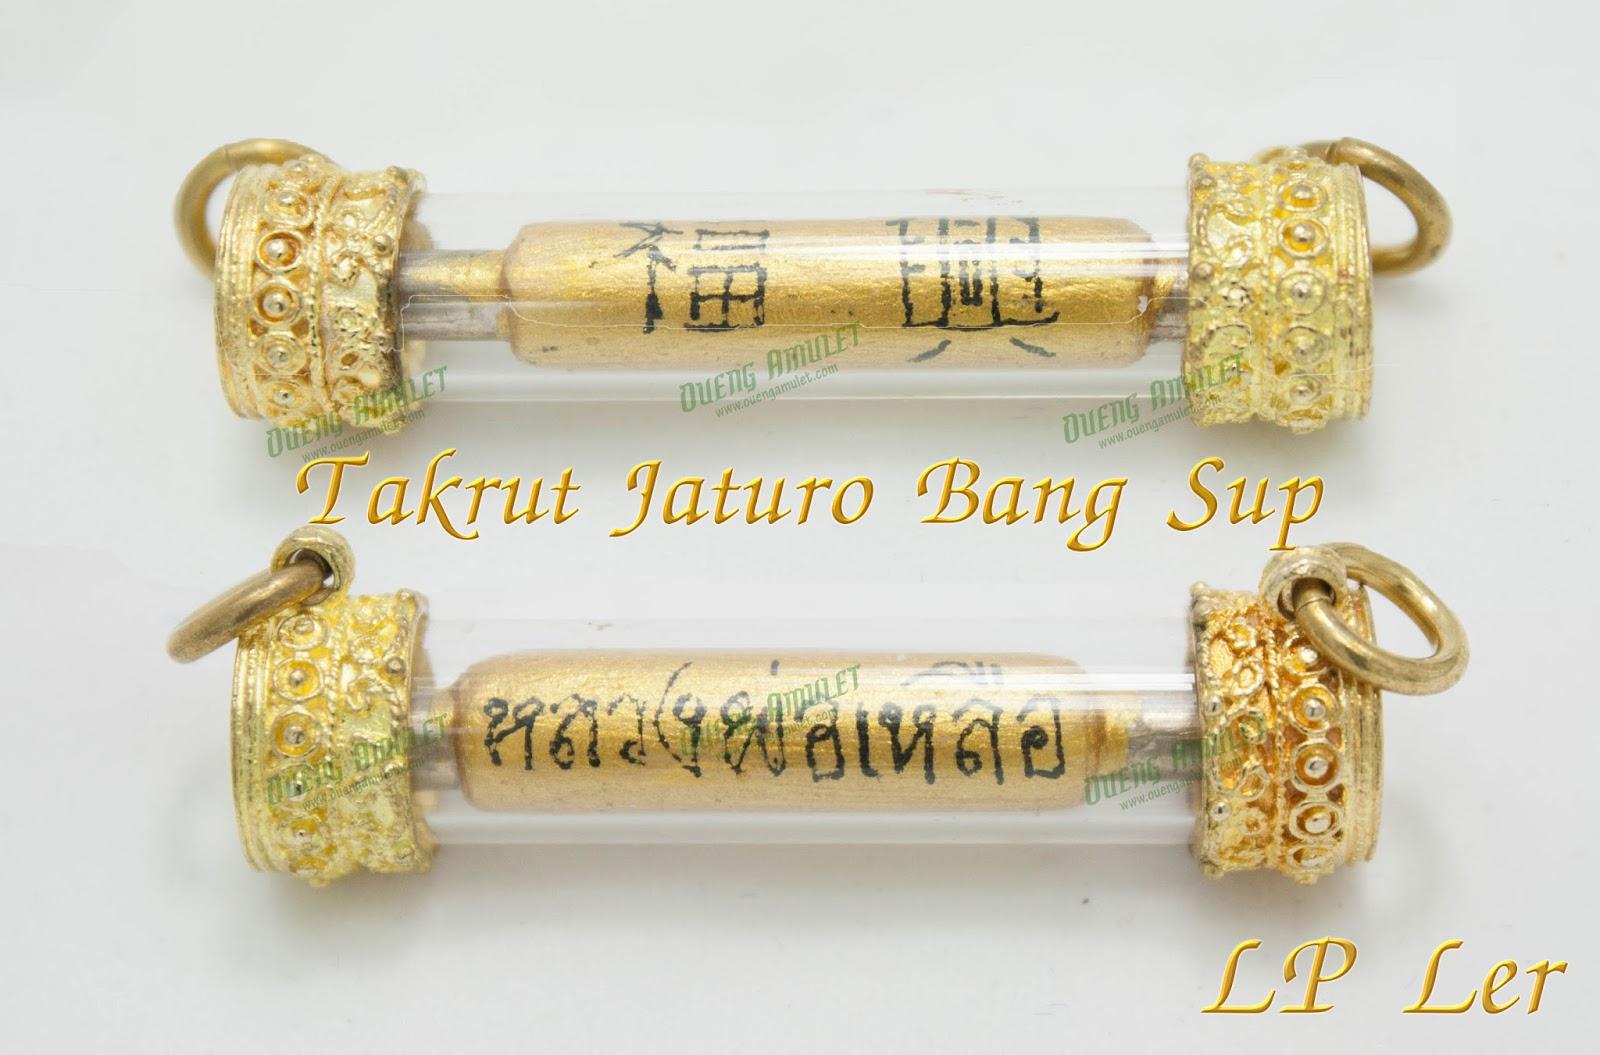 TAkrut Jaturo Bang Ked Sub (Fu heng) Consecrated by famous takrud maker in current era LP Ler LP Ler Hand-written Chinese characters u201cFU Hengu201d on the ...  sc 1 st  Oueng Amulet & Takrut Fu Heng (Prosperity u0026 Lucky Batch) LP Ler | Oueng Amulet